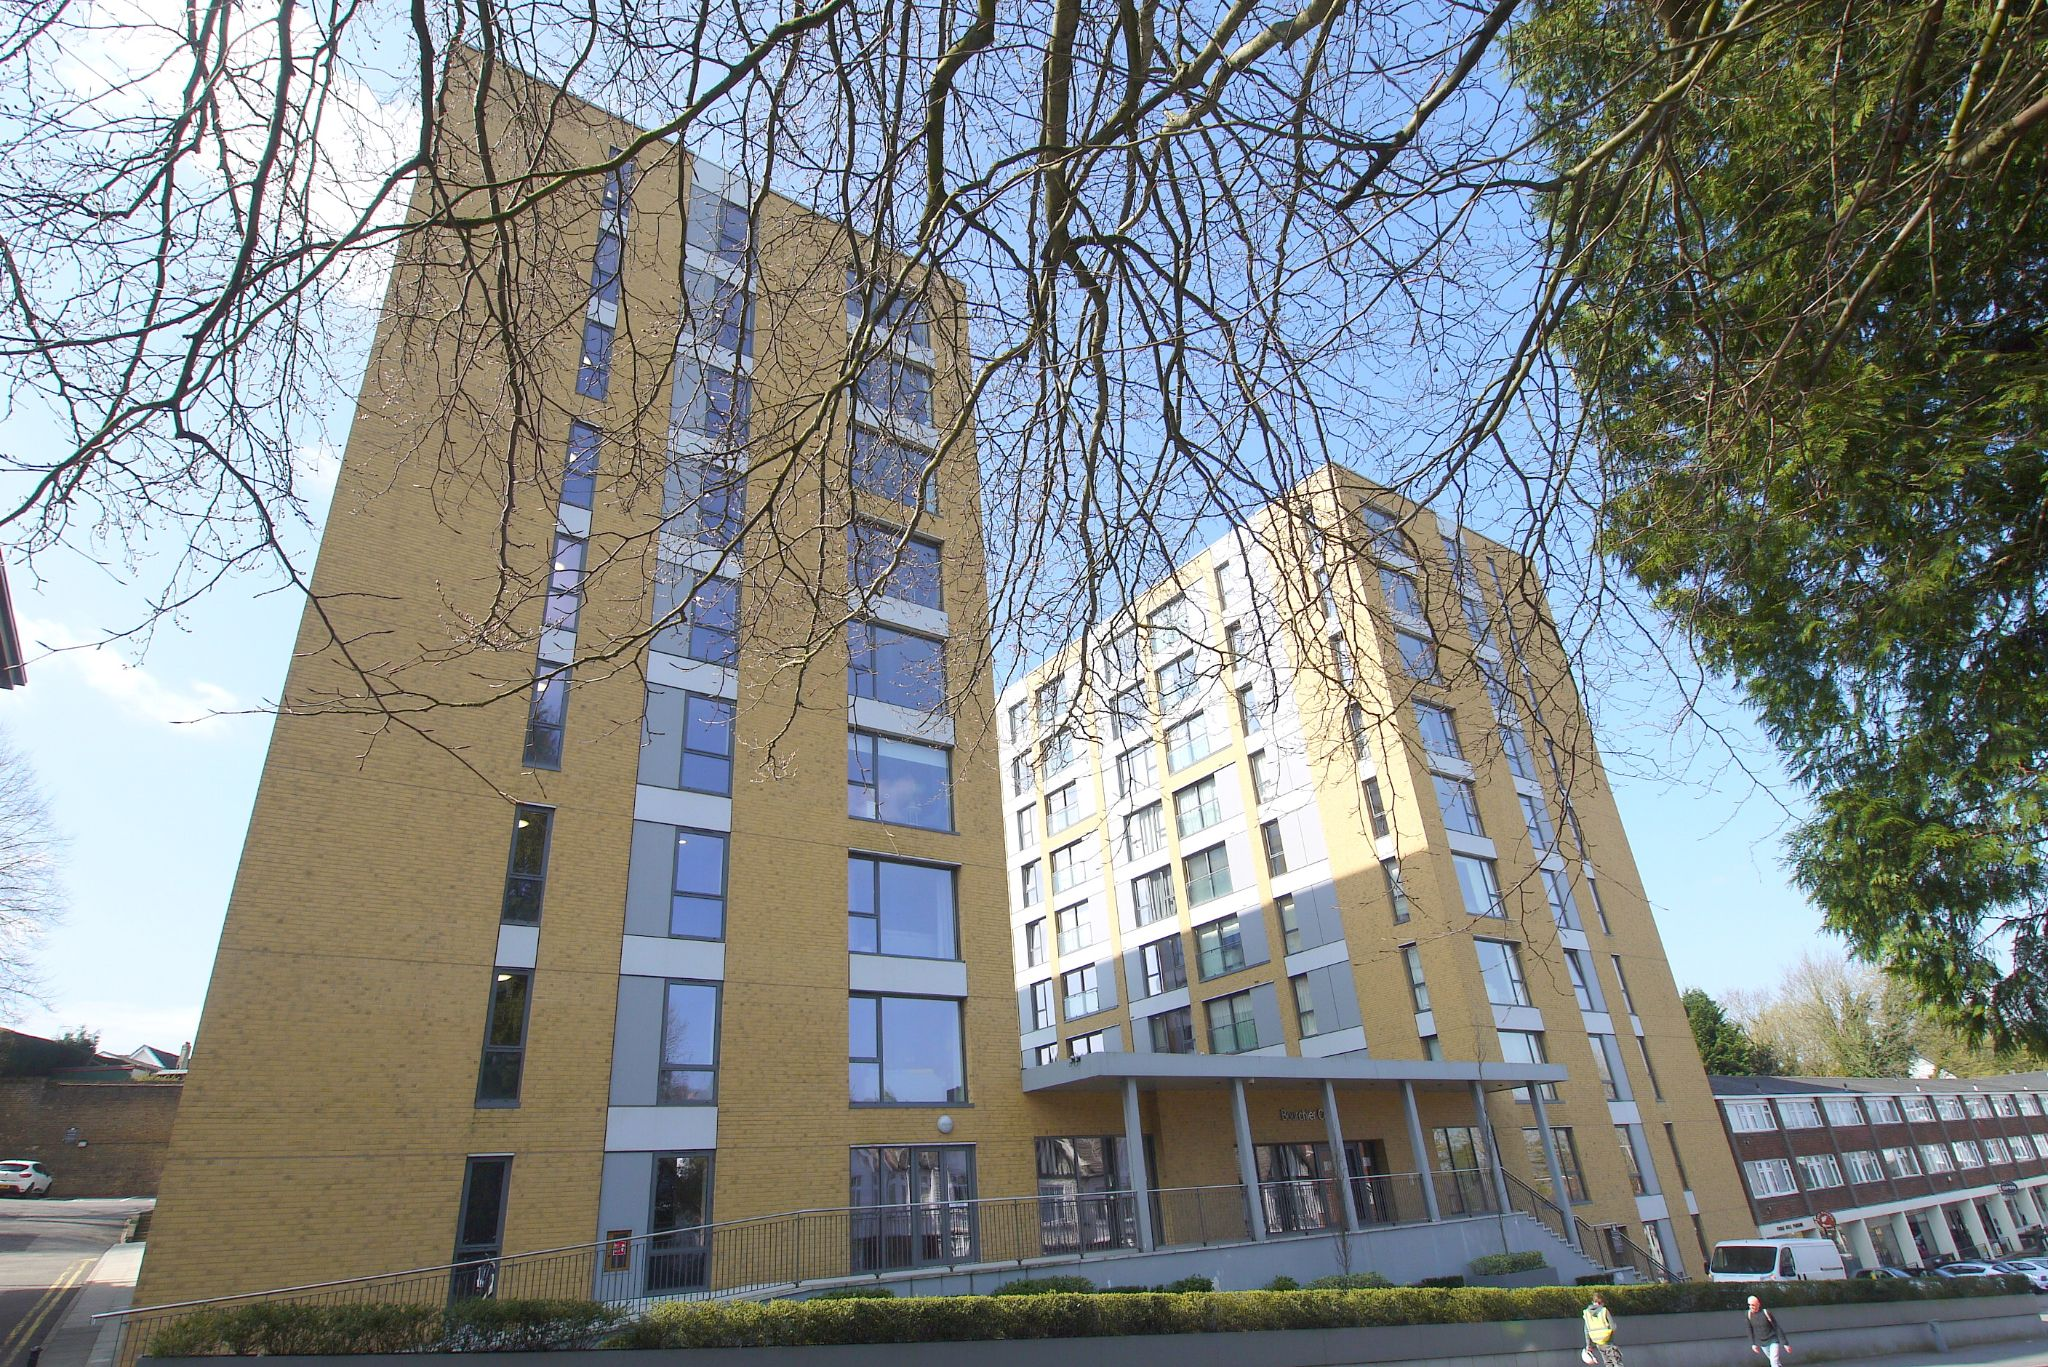 2 bedroom apartment For Sale in Sevenoaks - Photograph 1